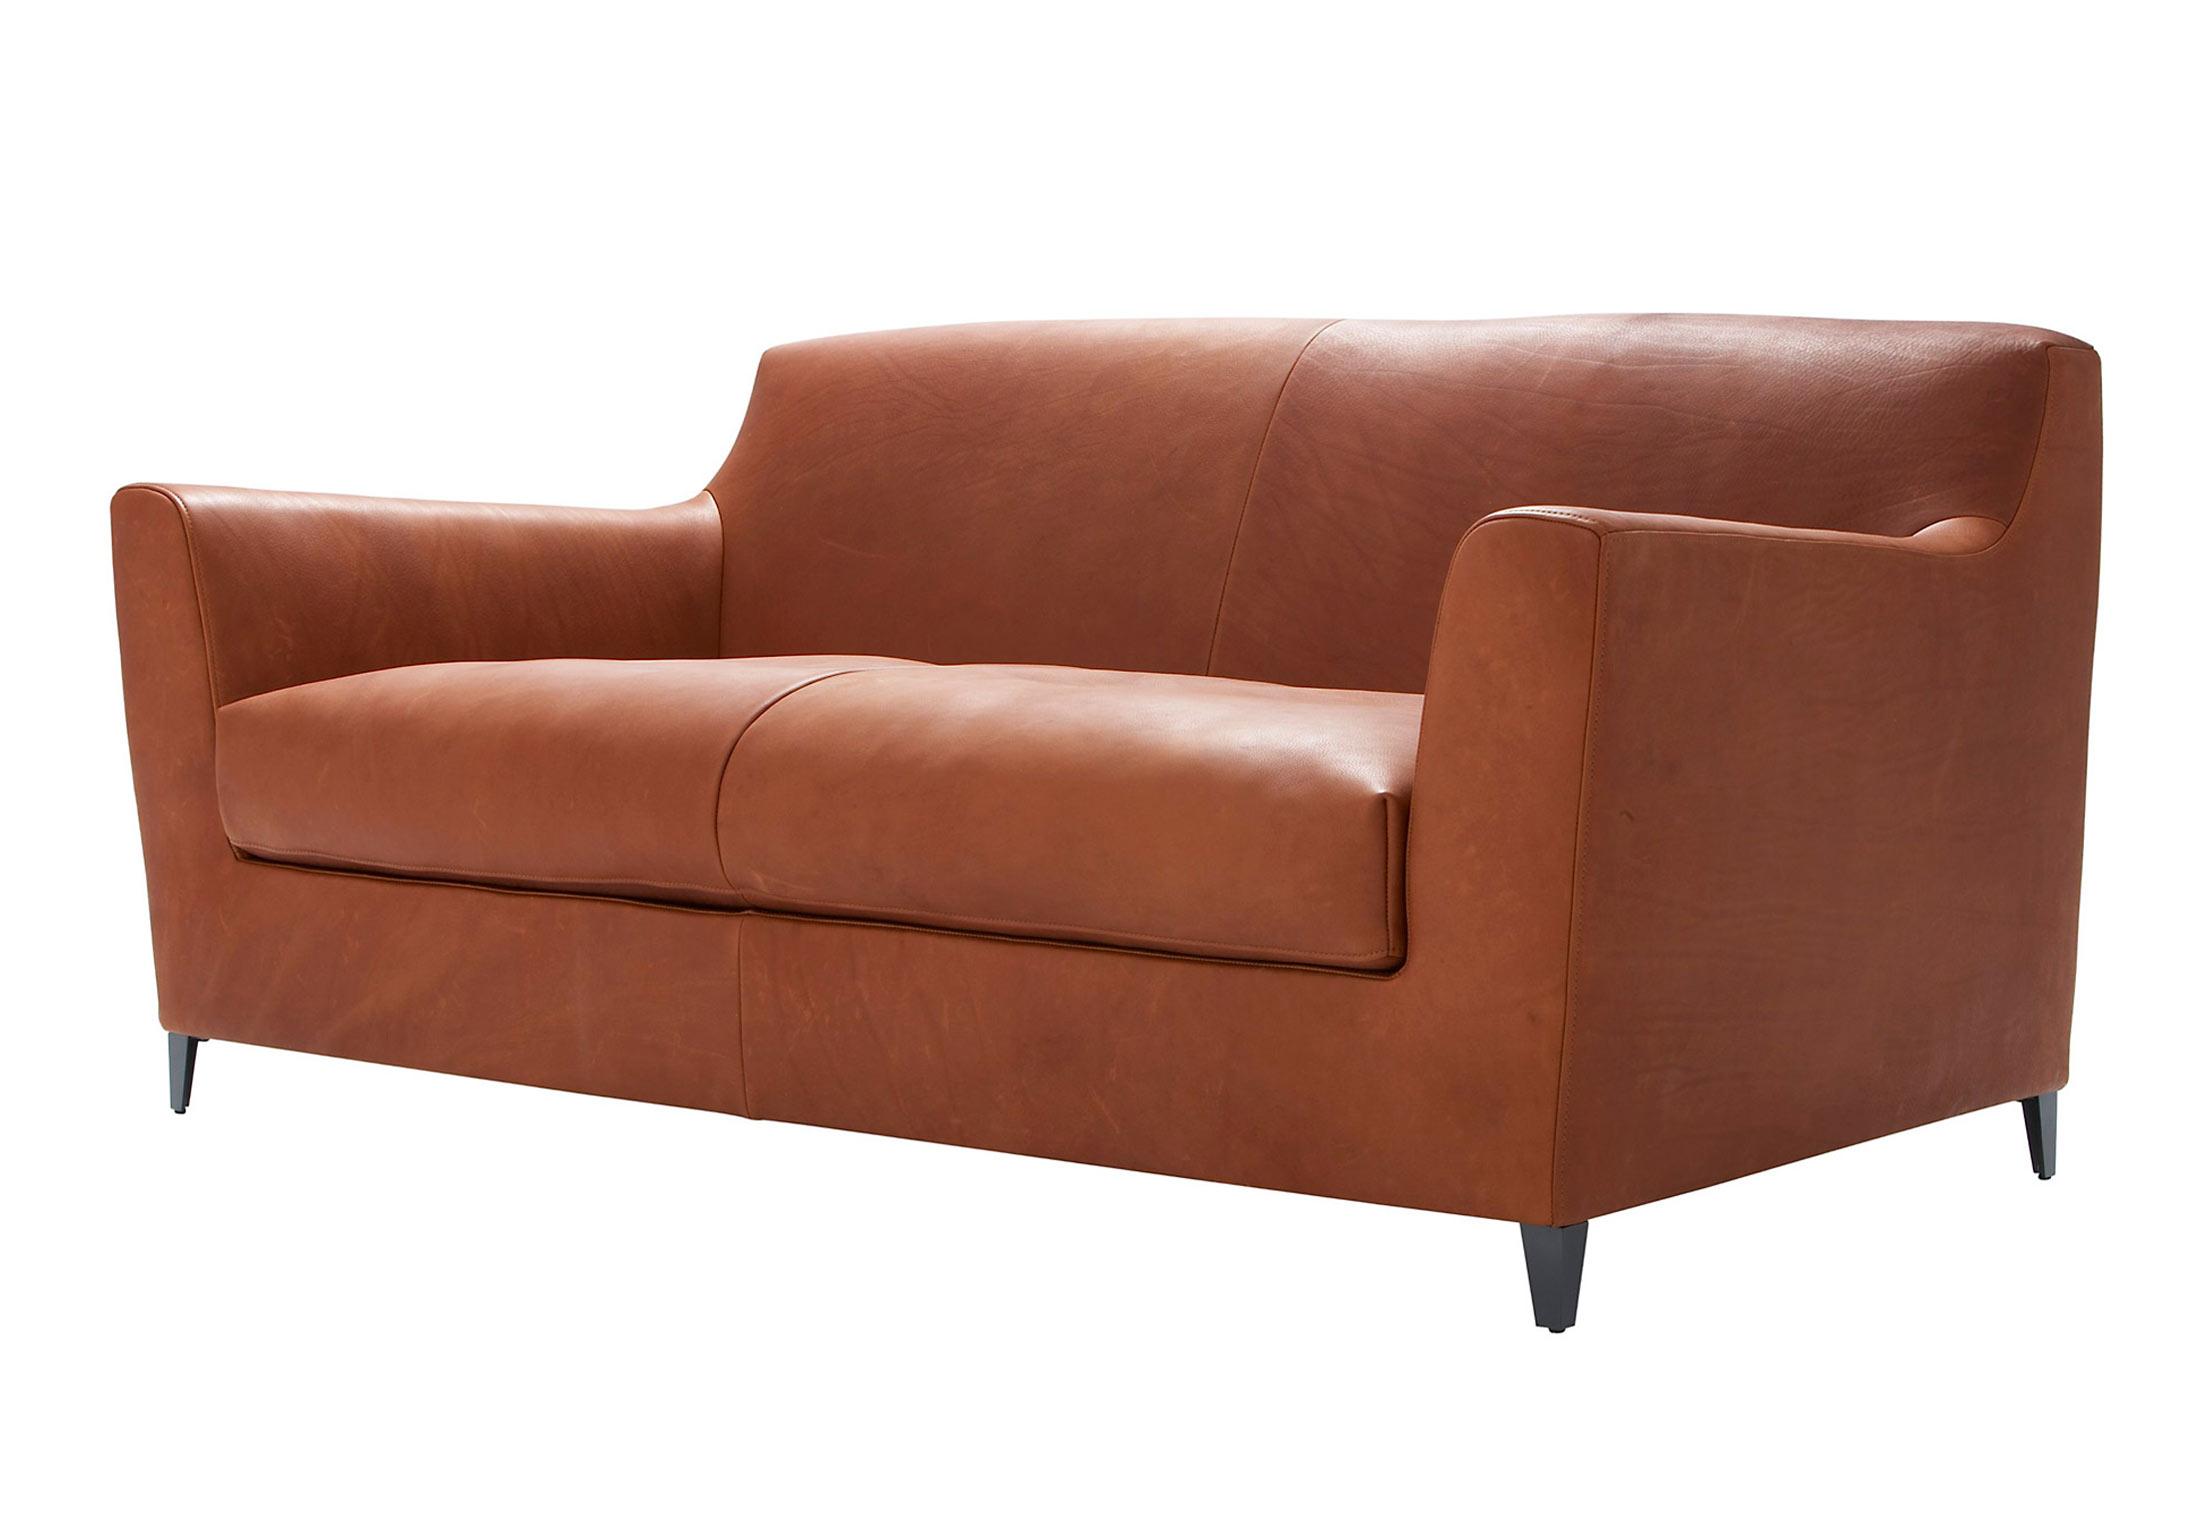 rive droite sofa by ligne roset stylepark. Black Bedroom Furniture Sets. Home Design Ideas